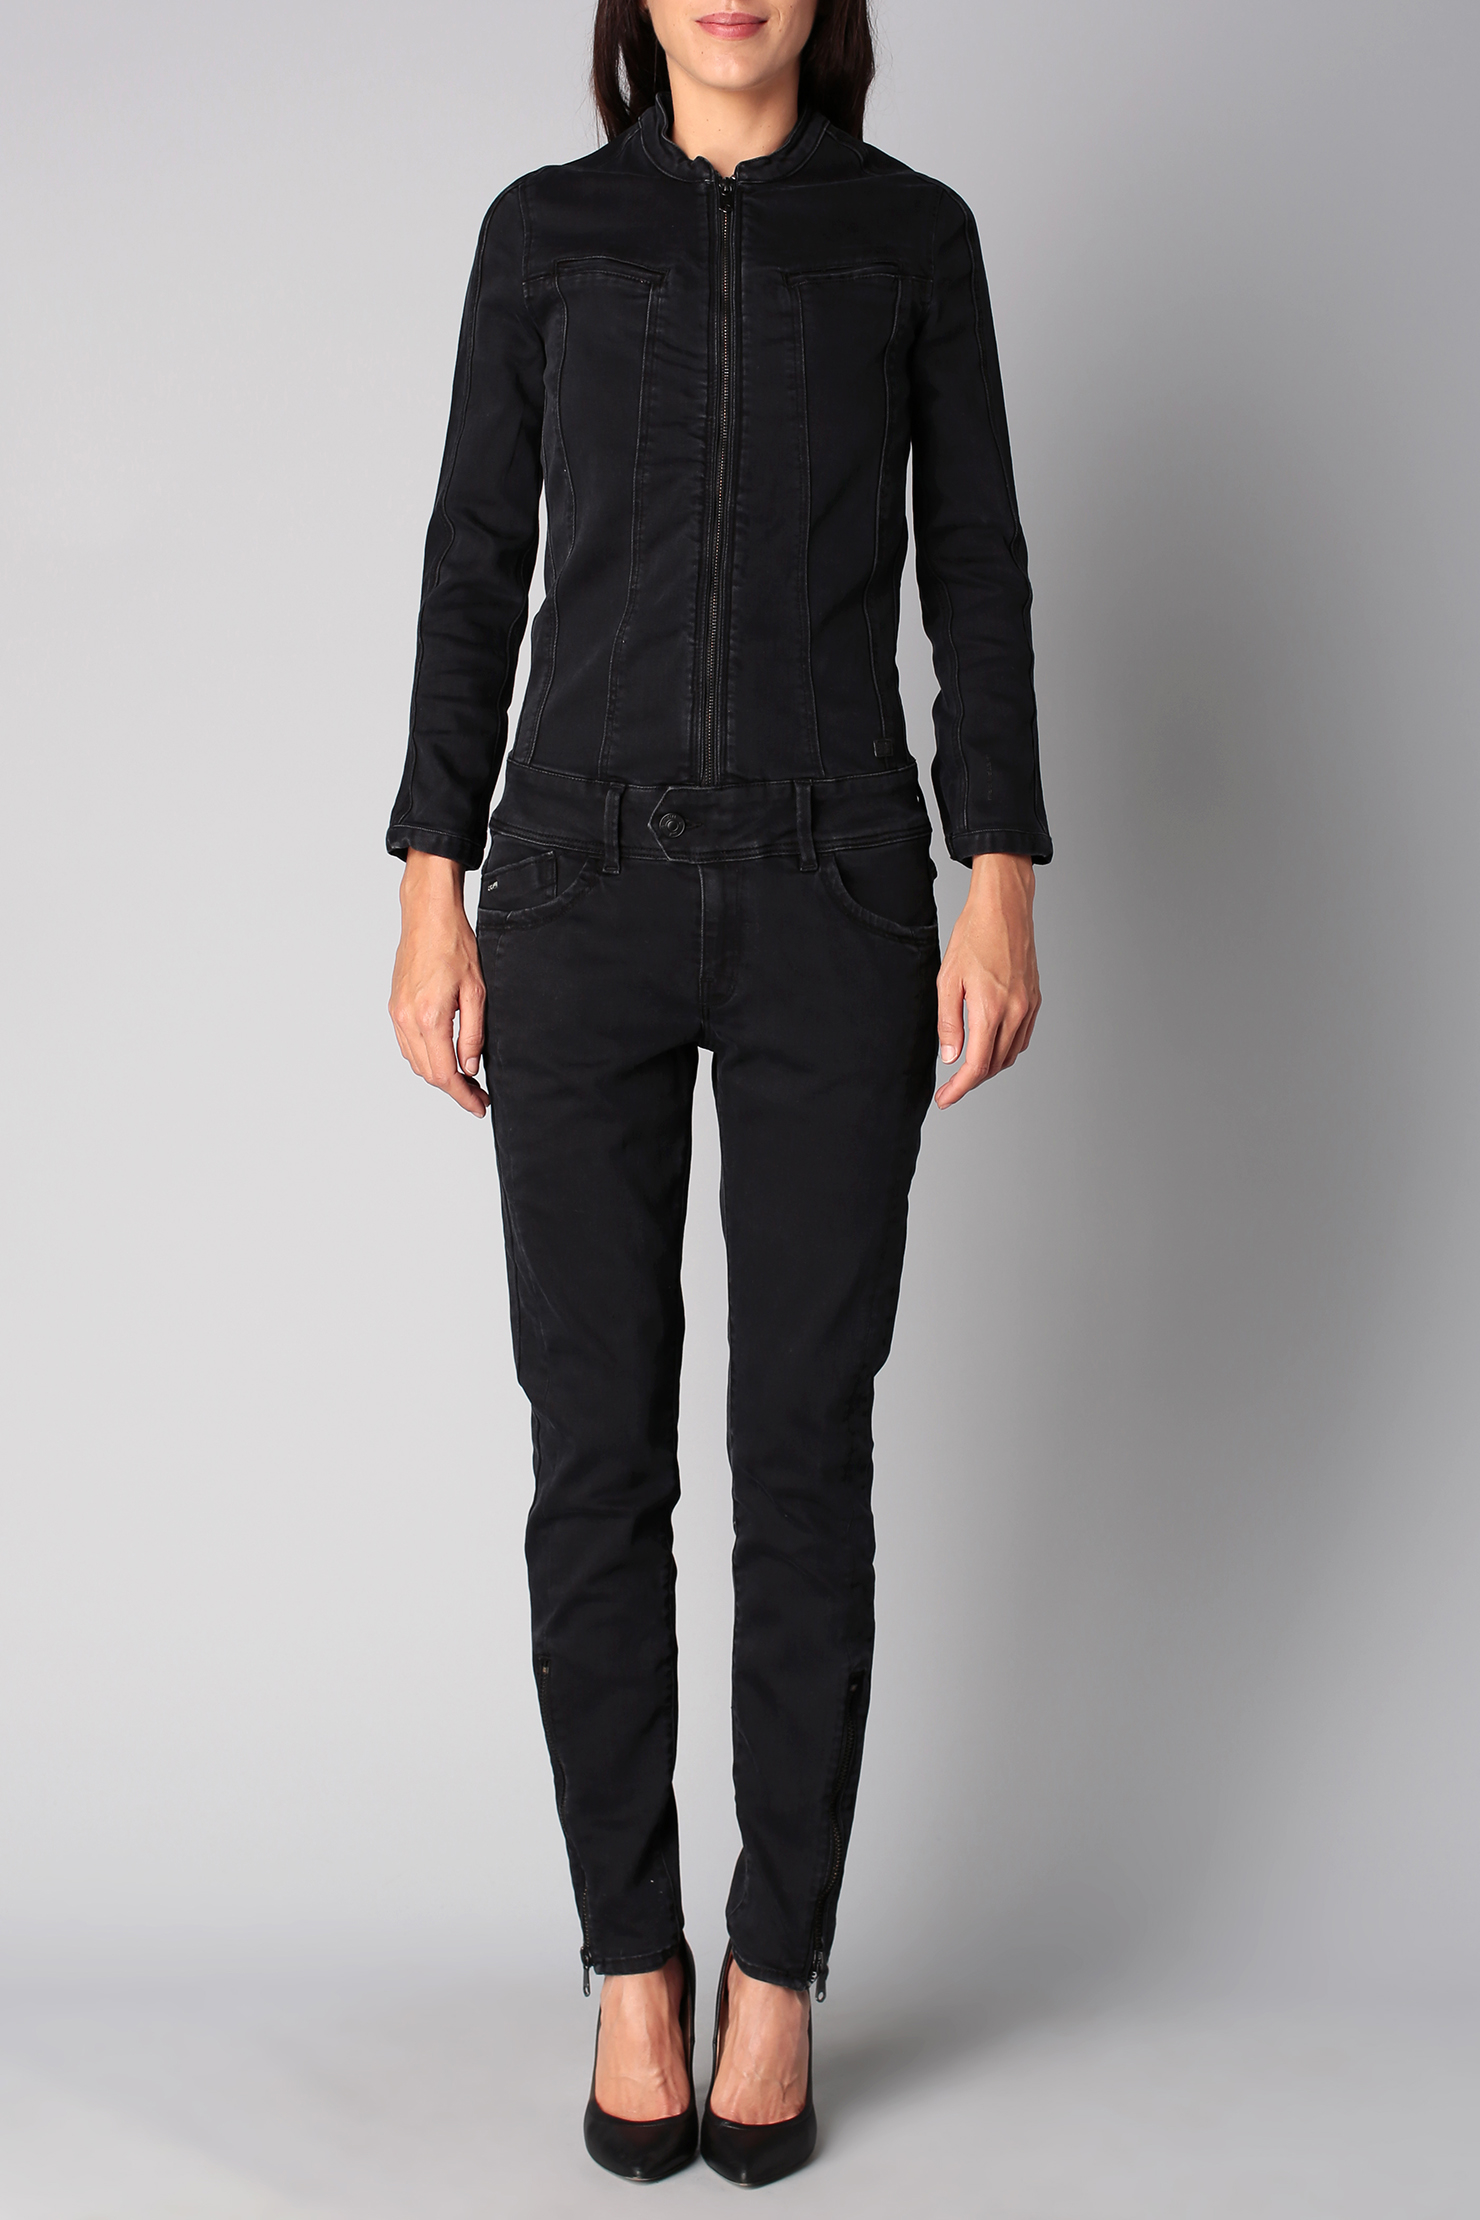 G Star Raw Jumpsuit In Black Lyst